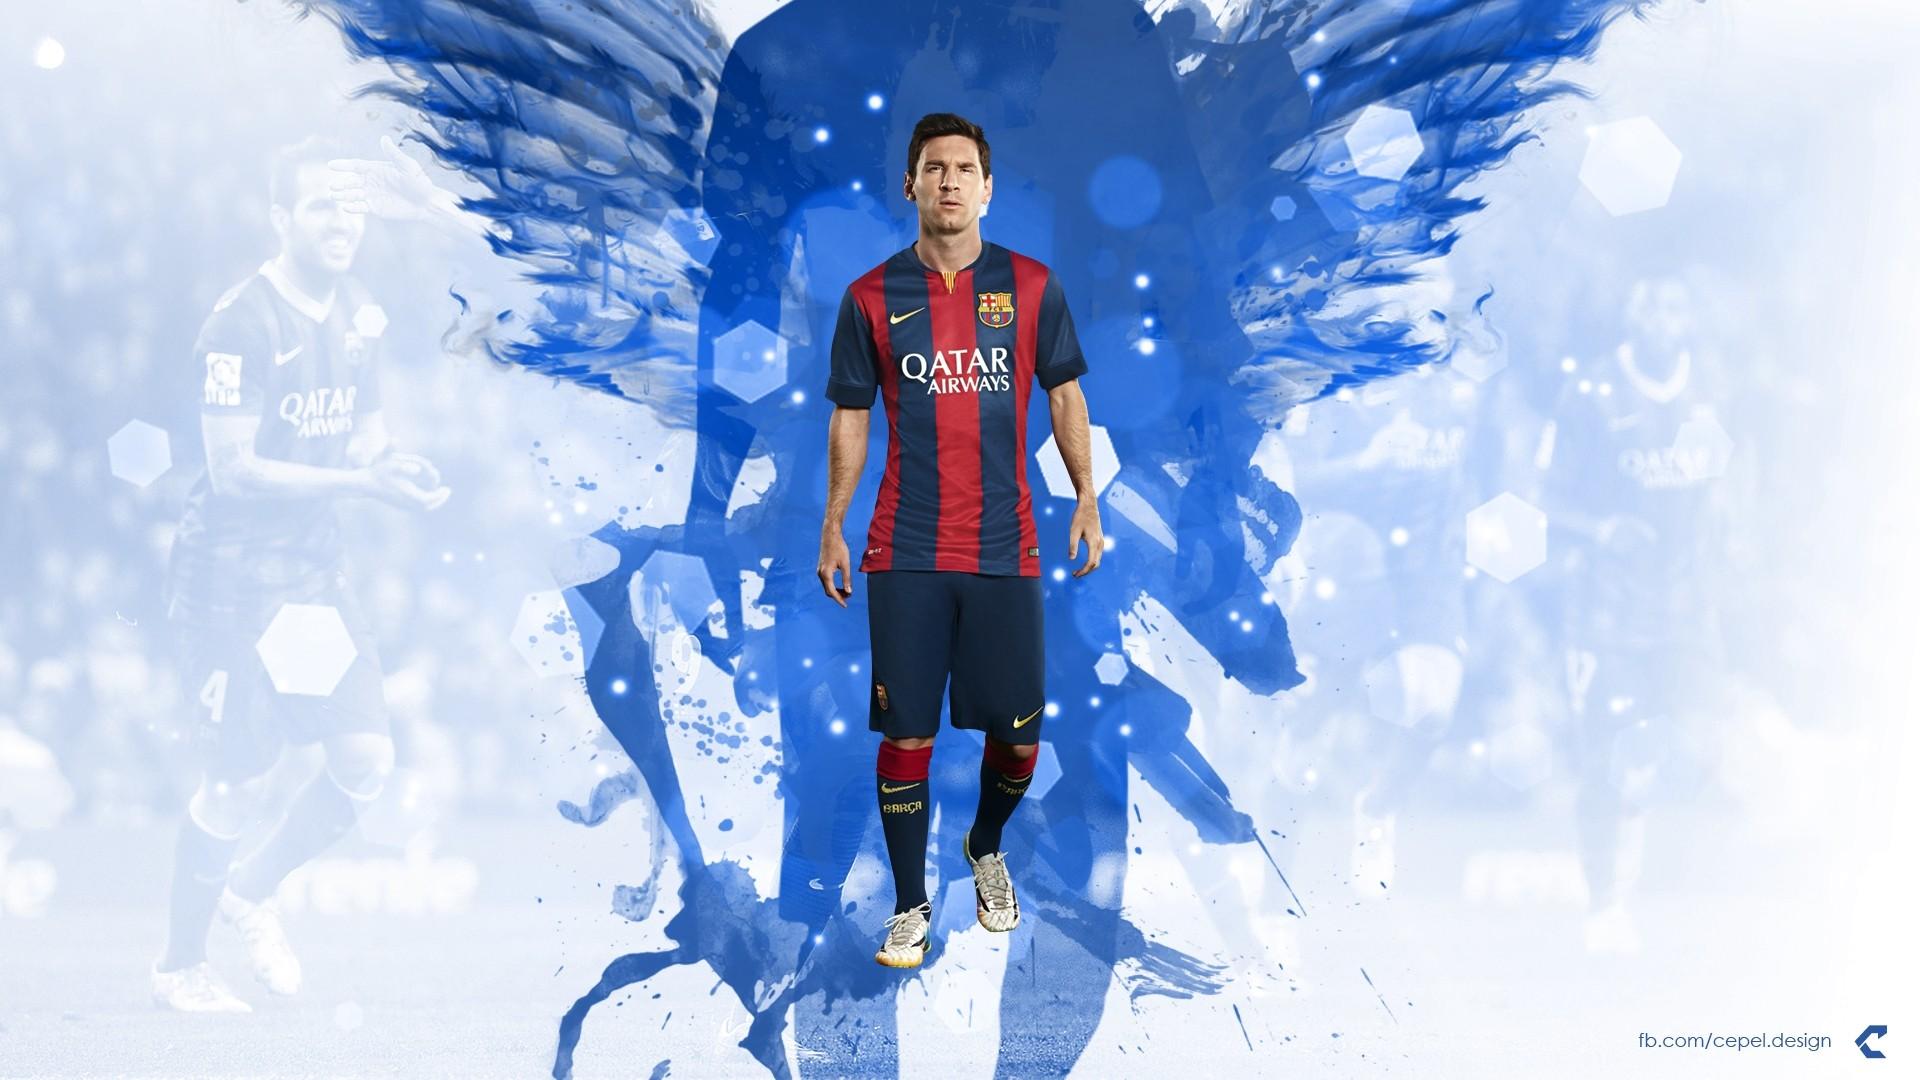 Lionel Messi Wallpaper image hd